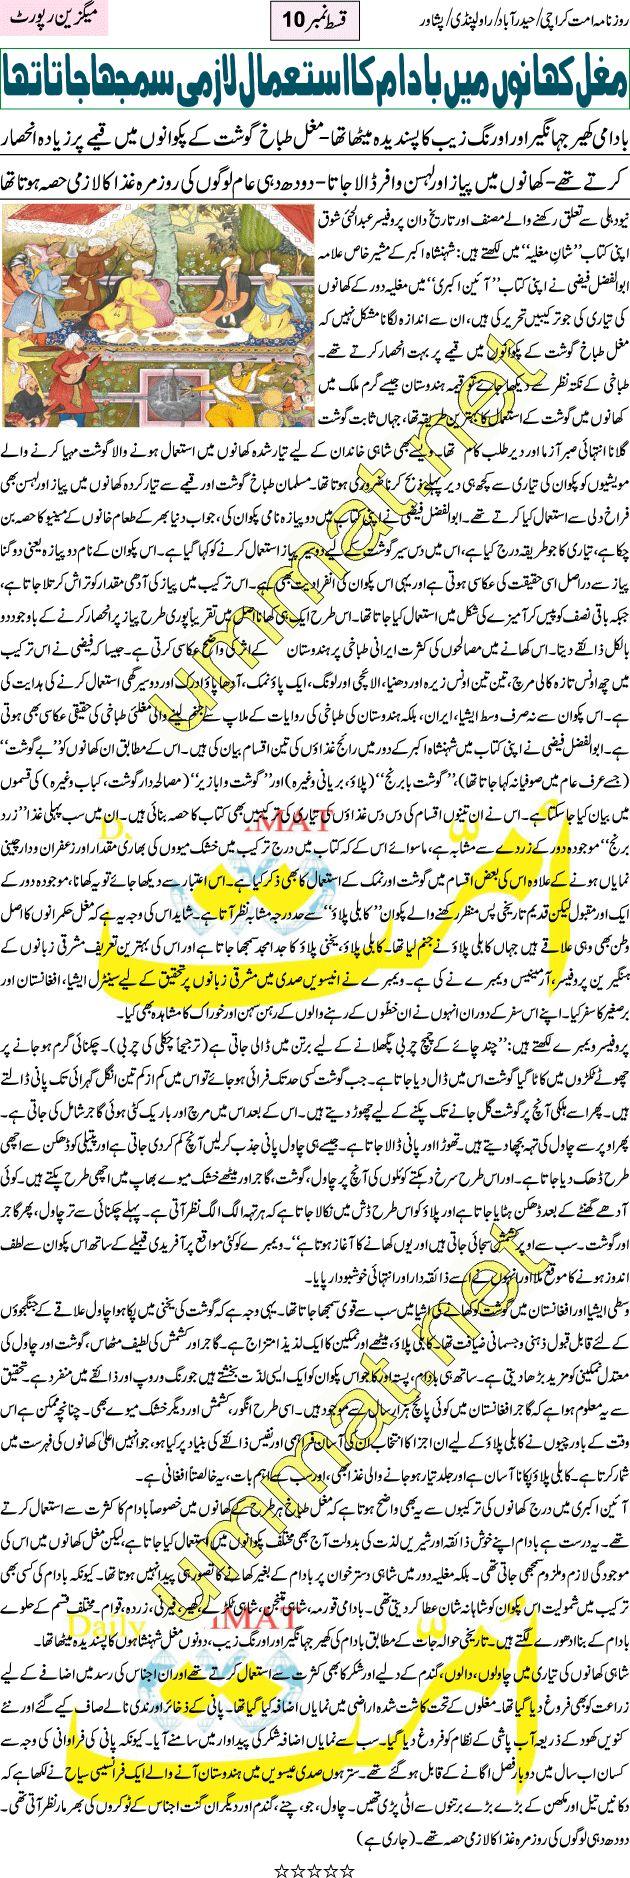 Ummat Publications | Daily Ummat Karachi provides latest news in urdu language.